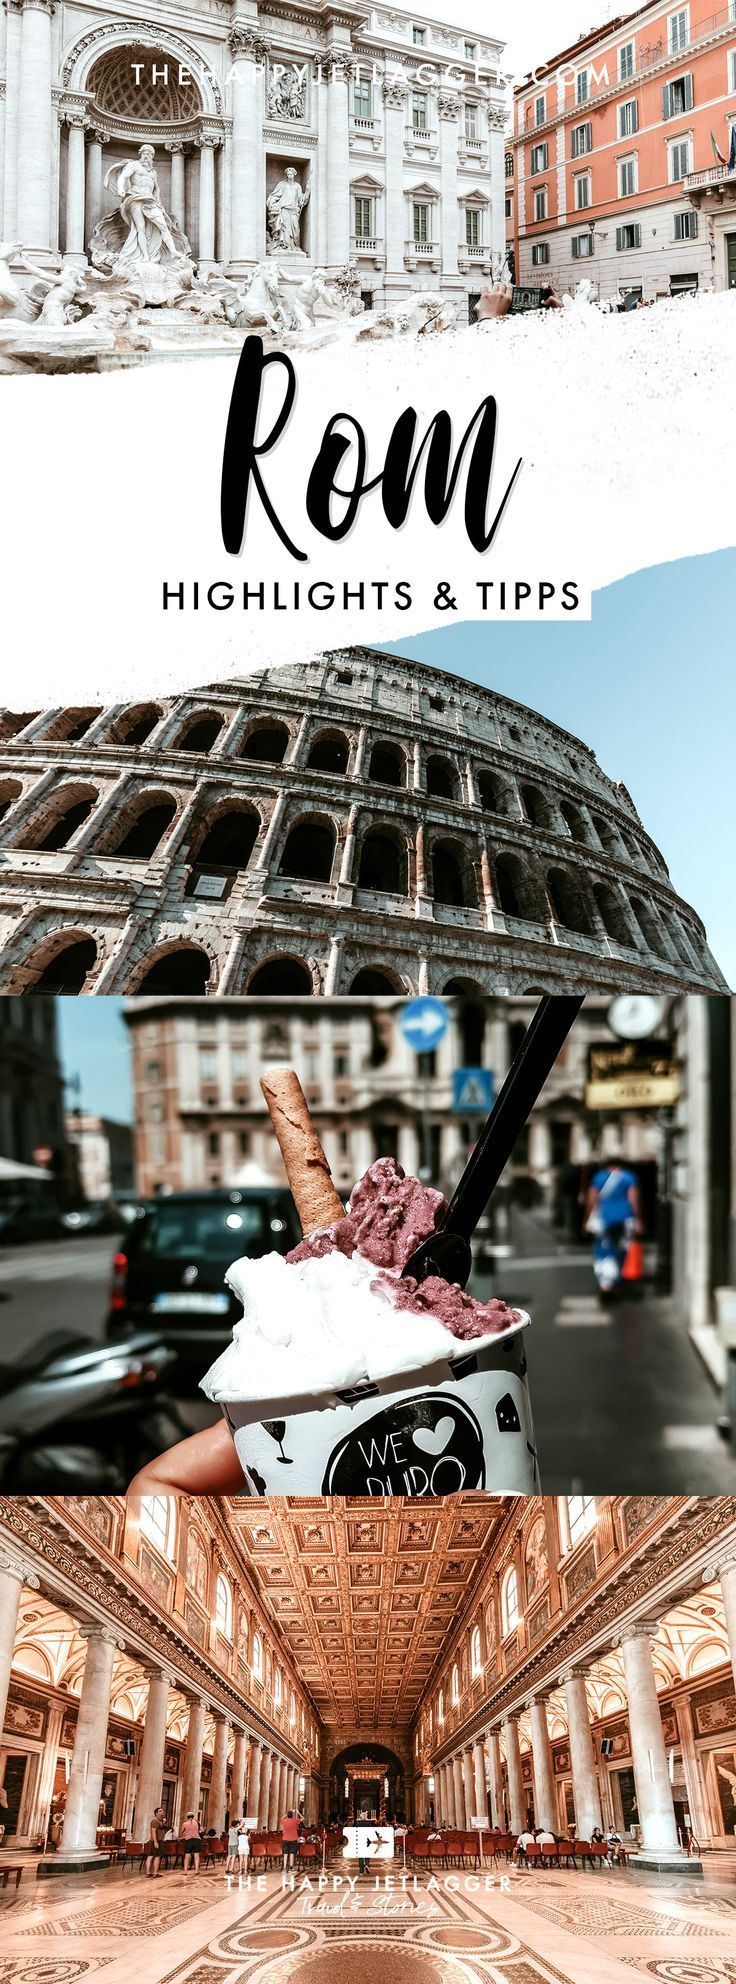 Rom 5 Klassiker In Der Ewigen Stadt Rom Sehenswurdigkeiten Rom Reise Rom Reisetipps